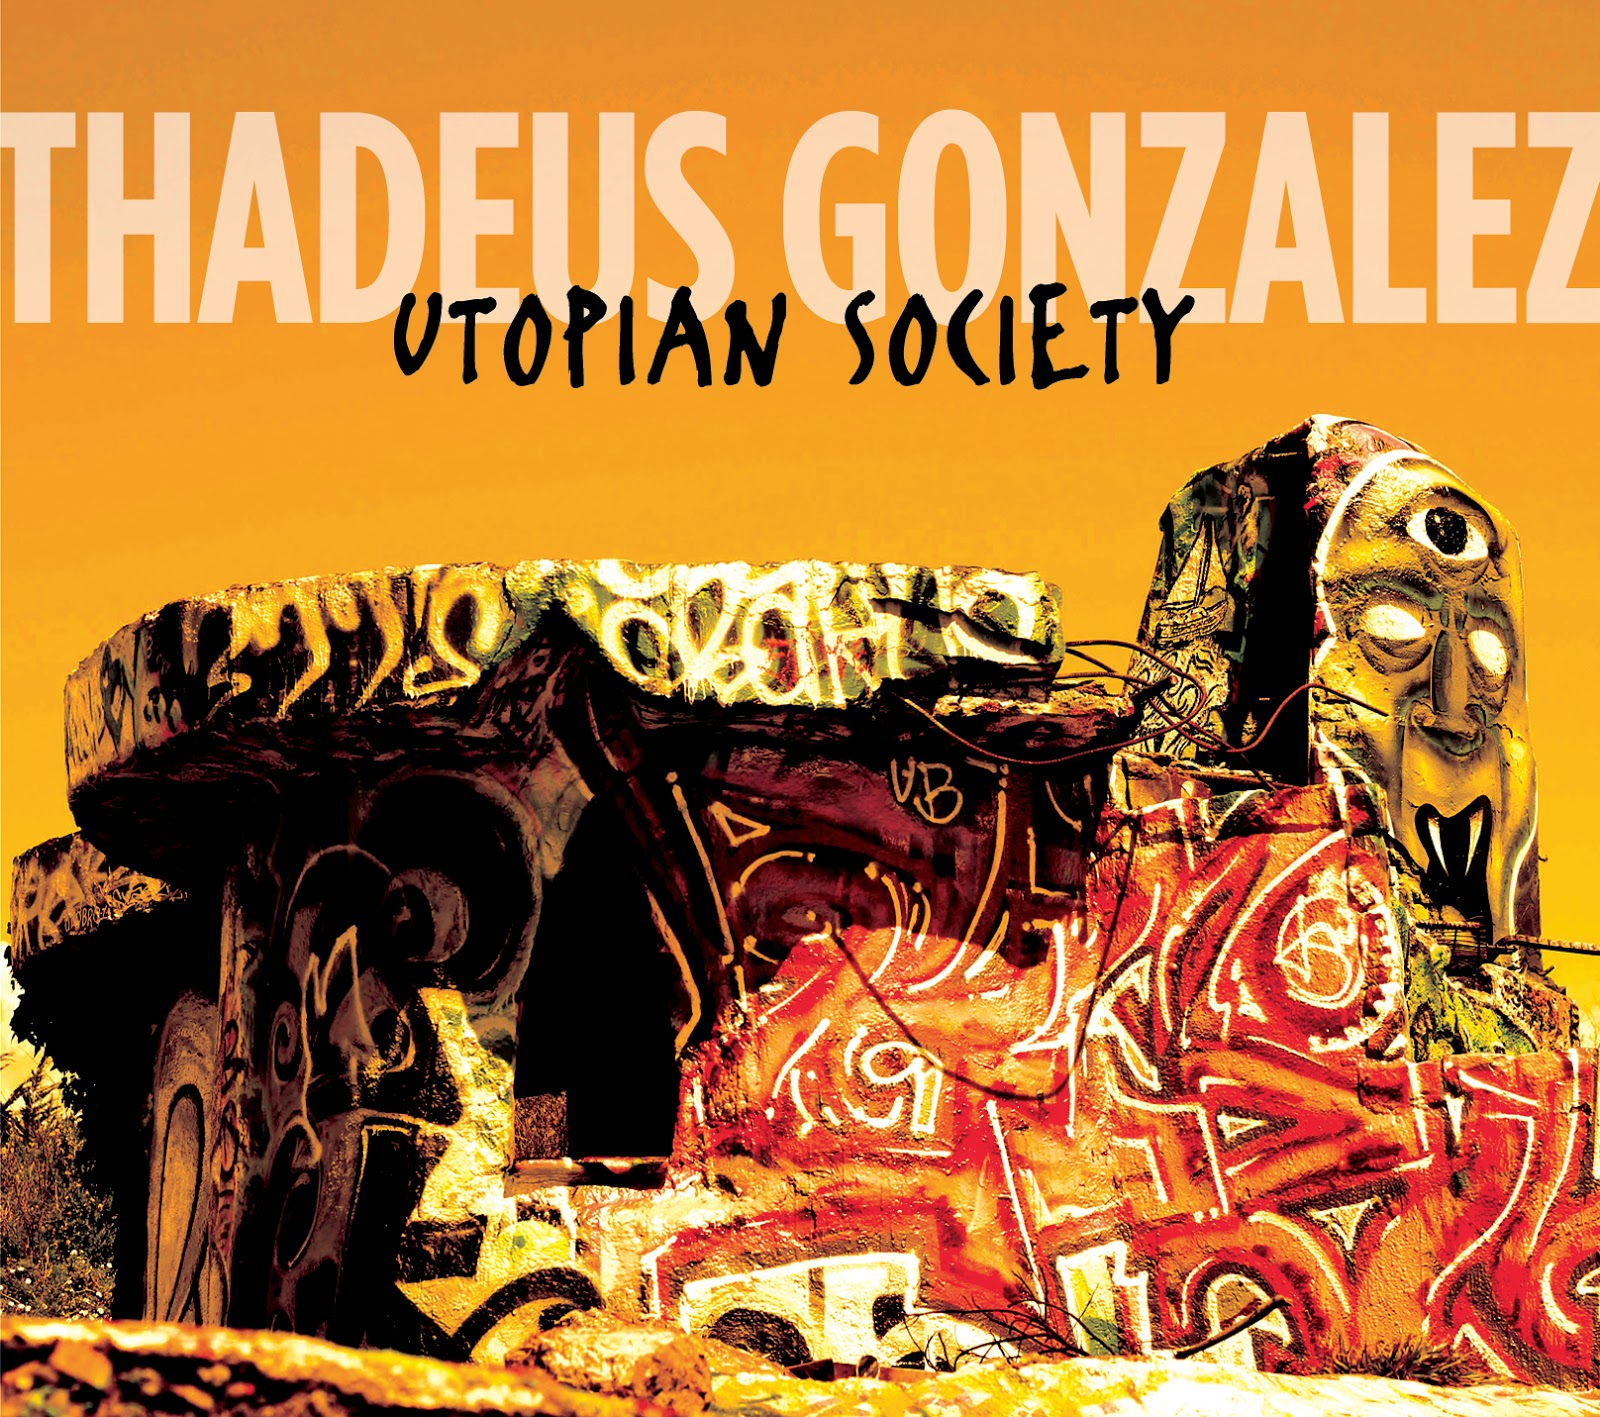 essay on utopia disneys utopian community